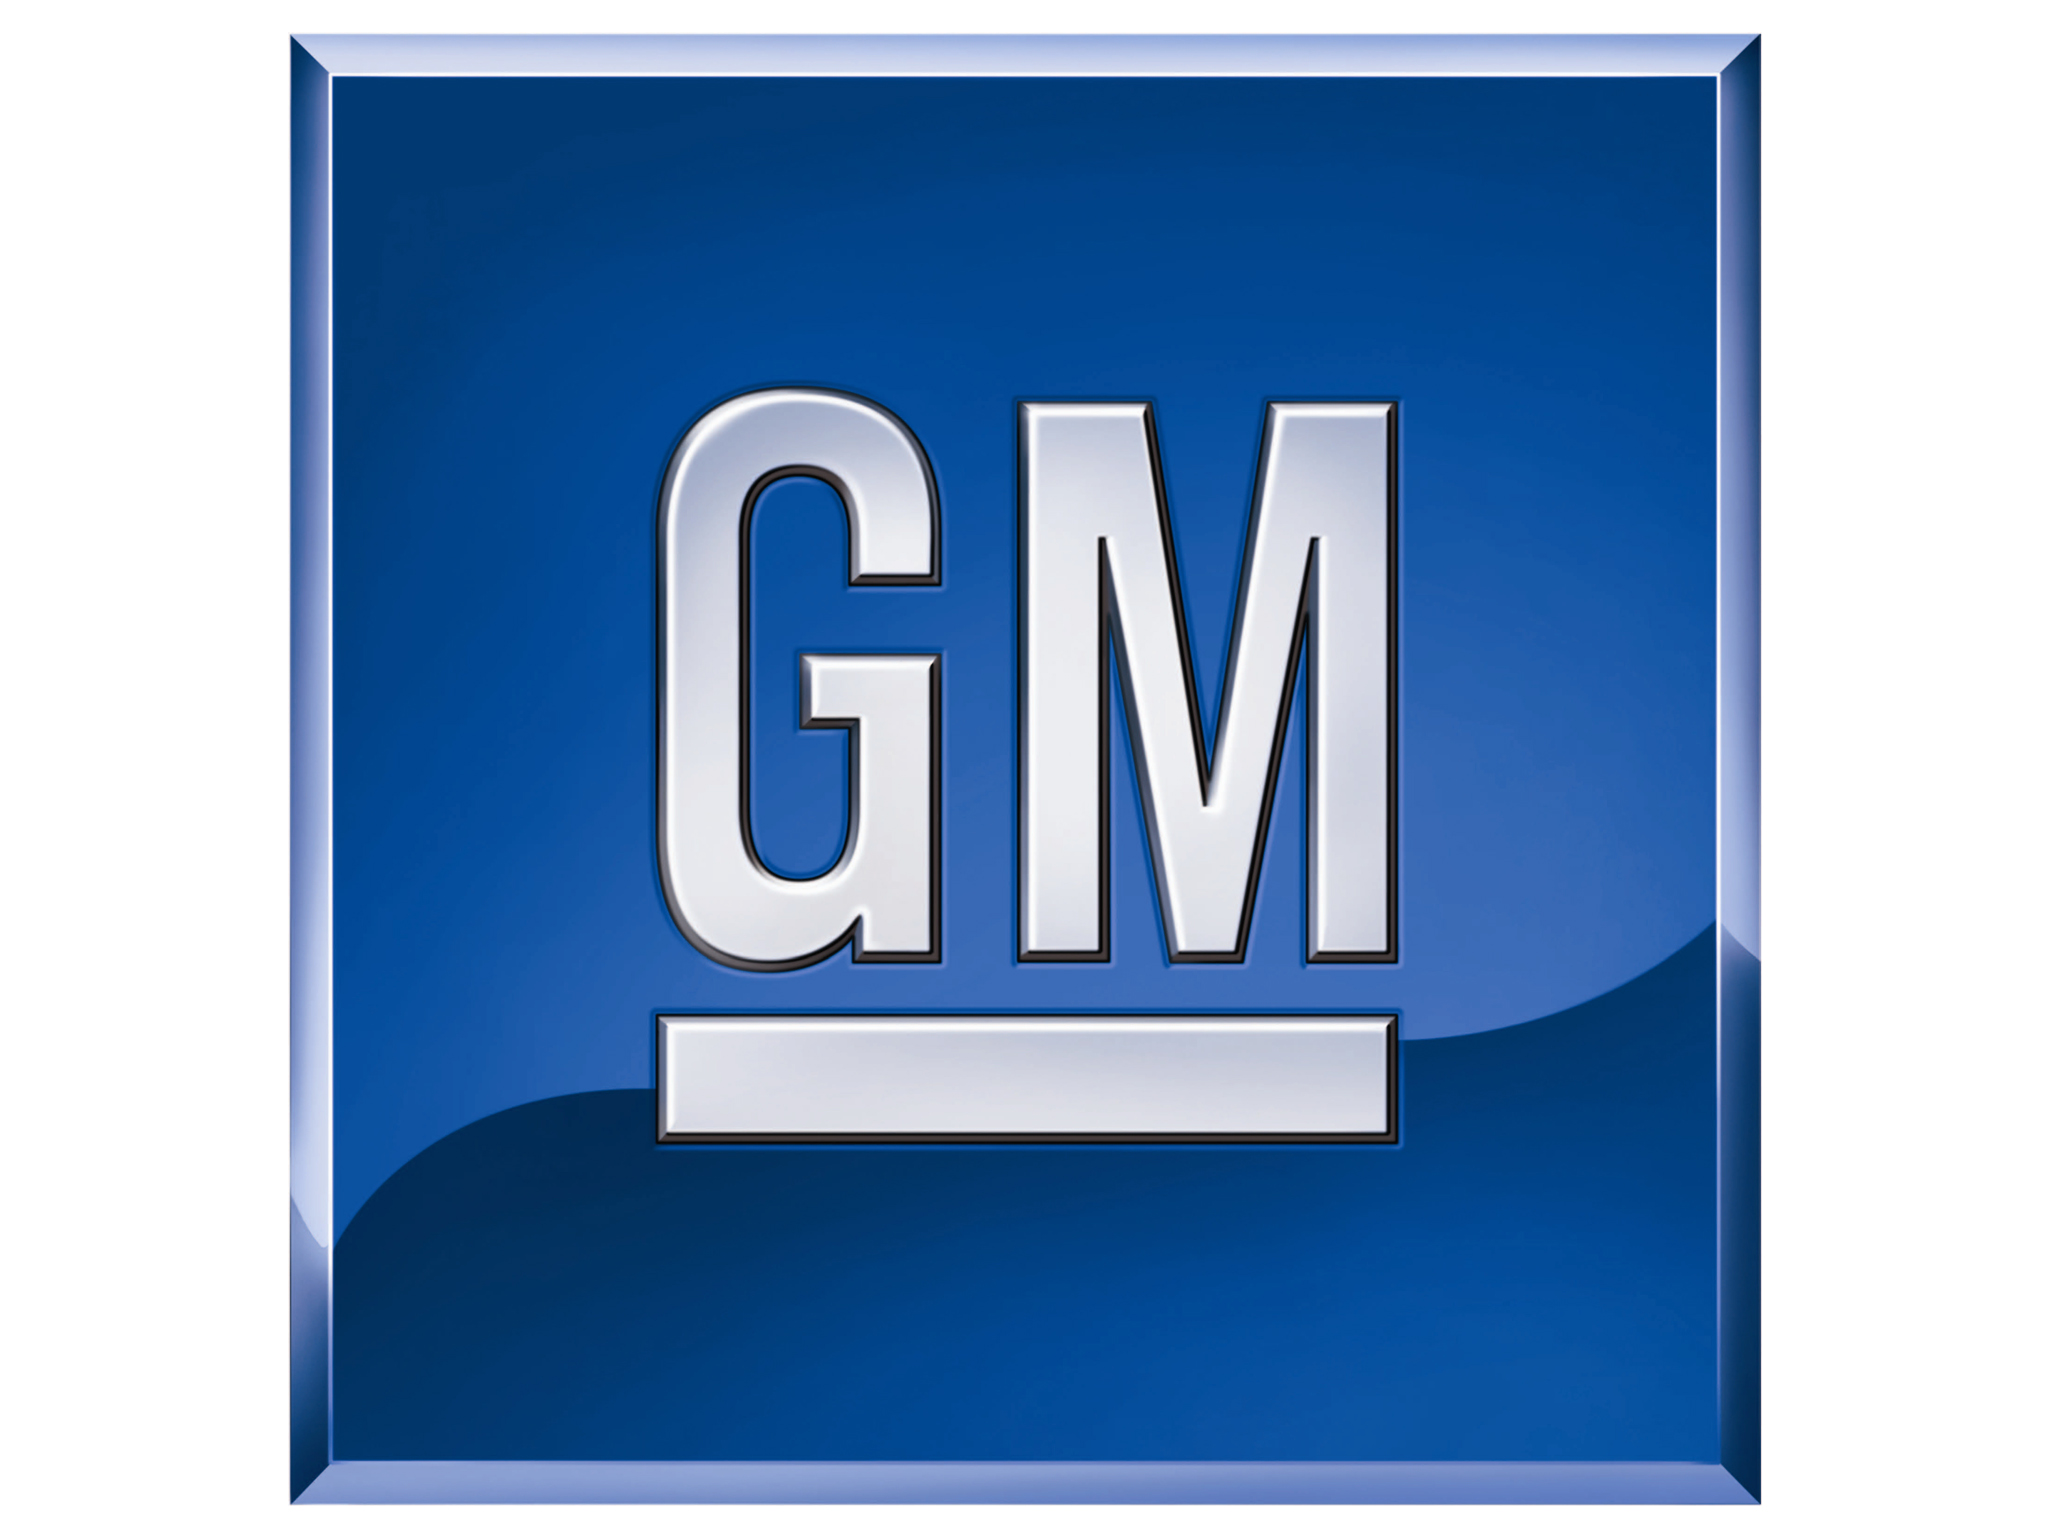 General Motors loses 4.5% of net profit